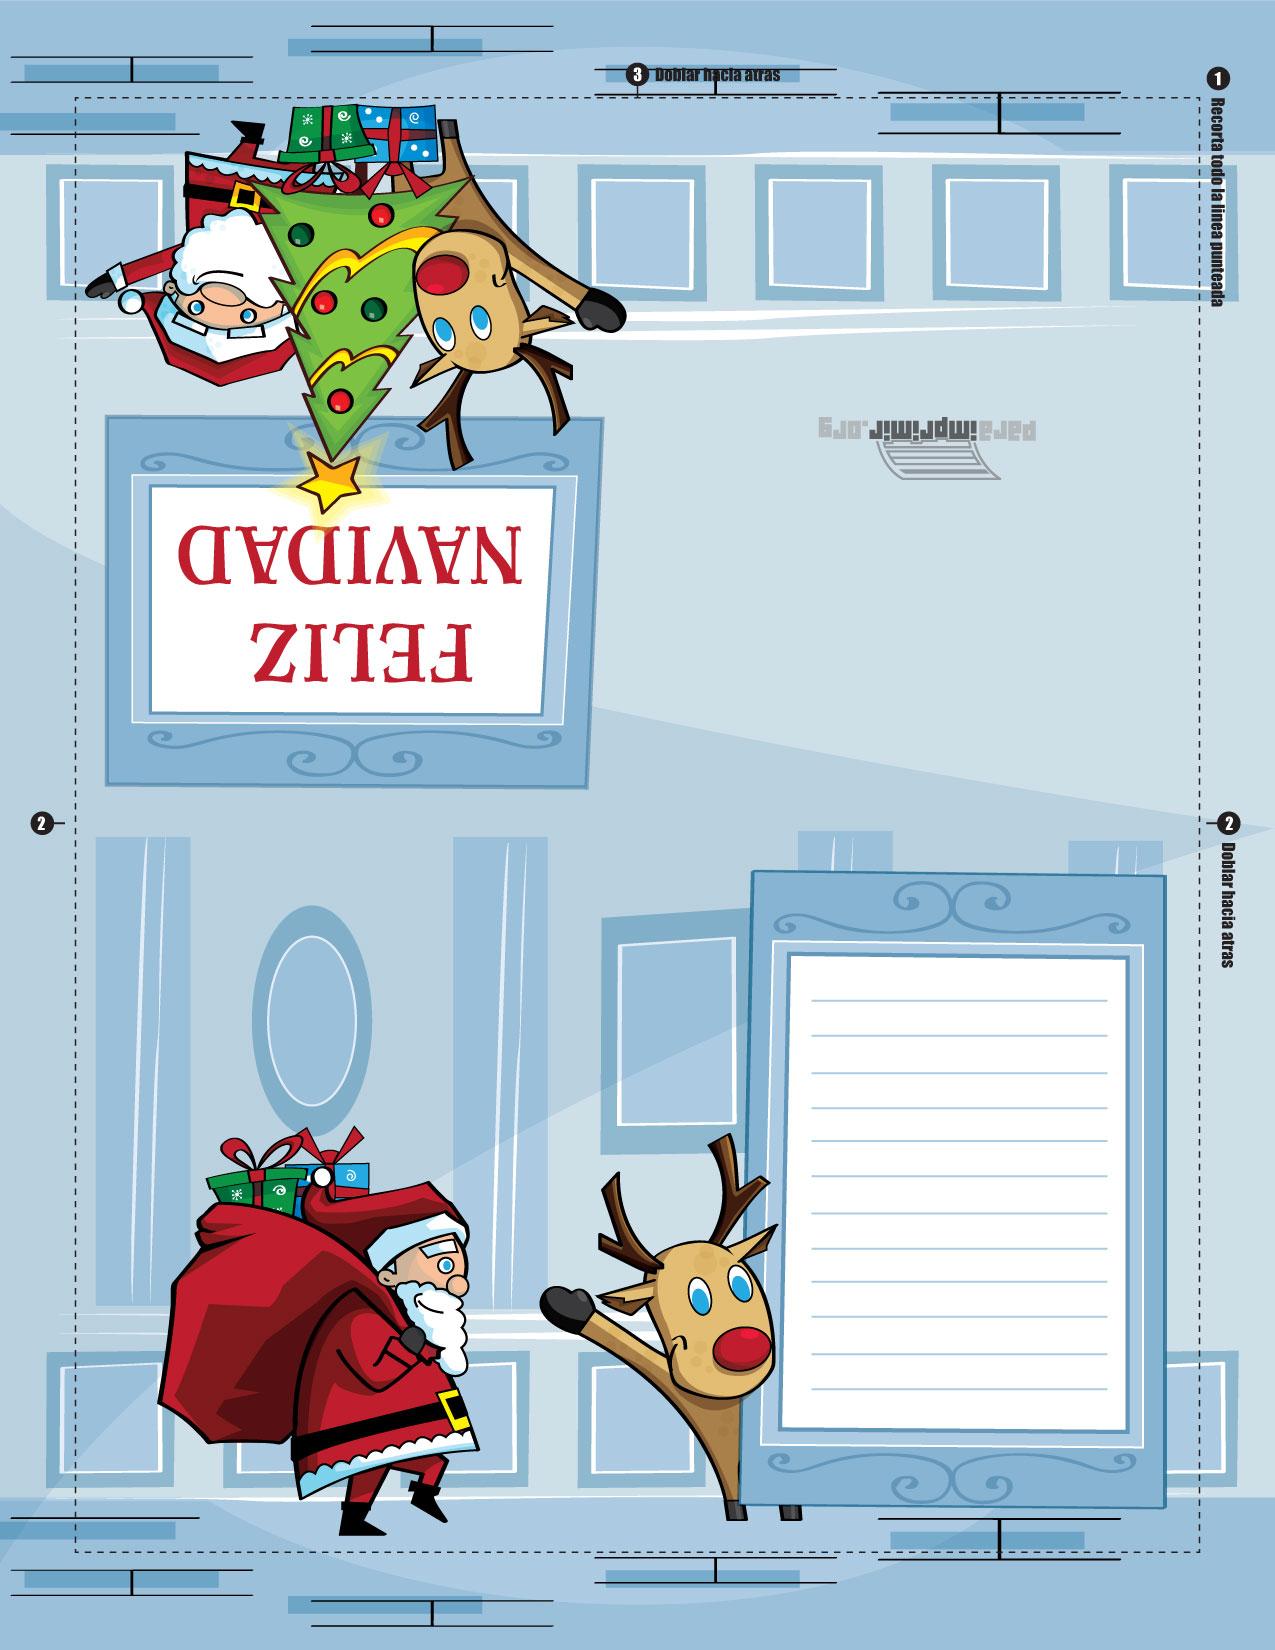 Tarjeta de navidad para imprimir - Sobre de navidad para imprimir ...